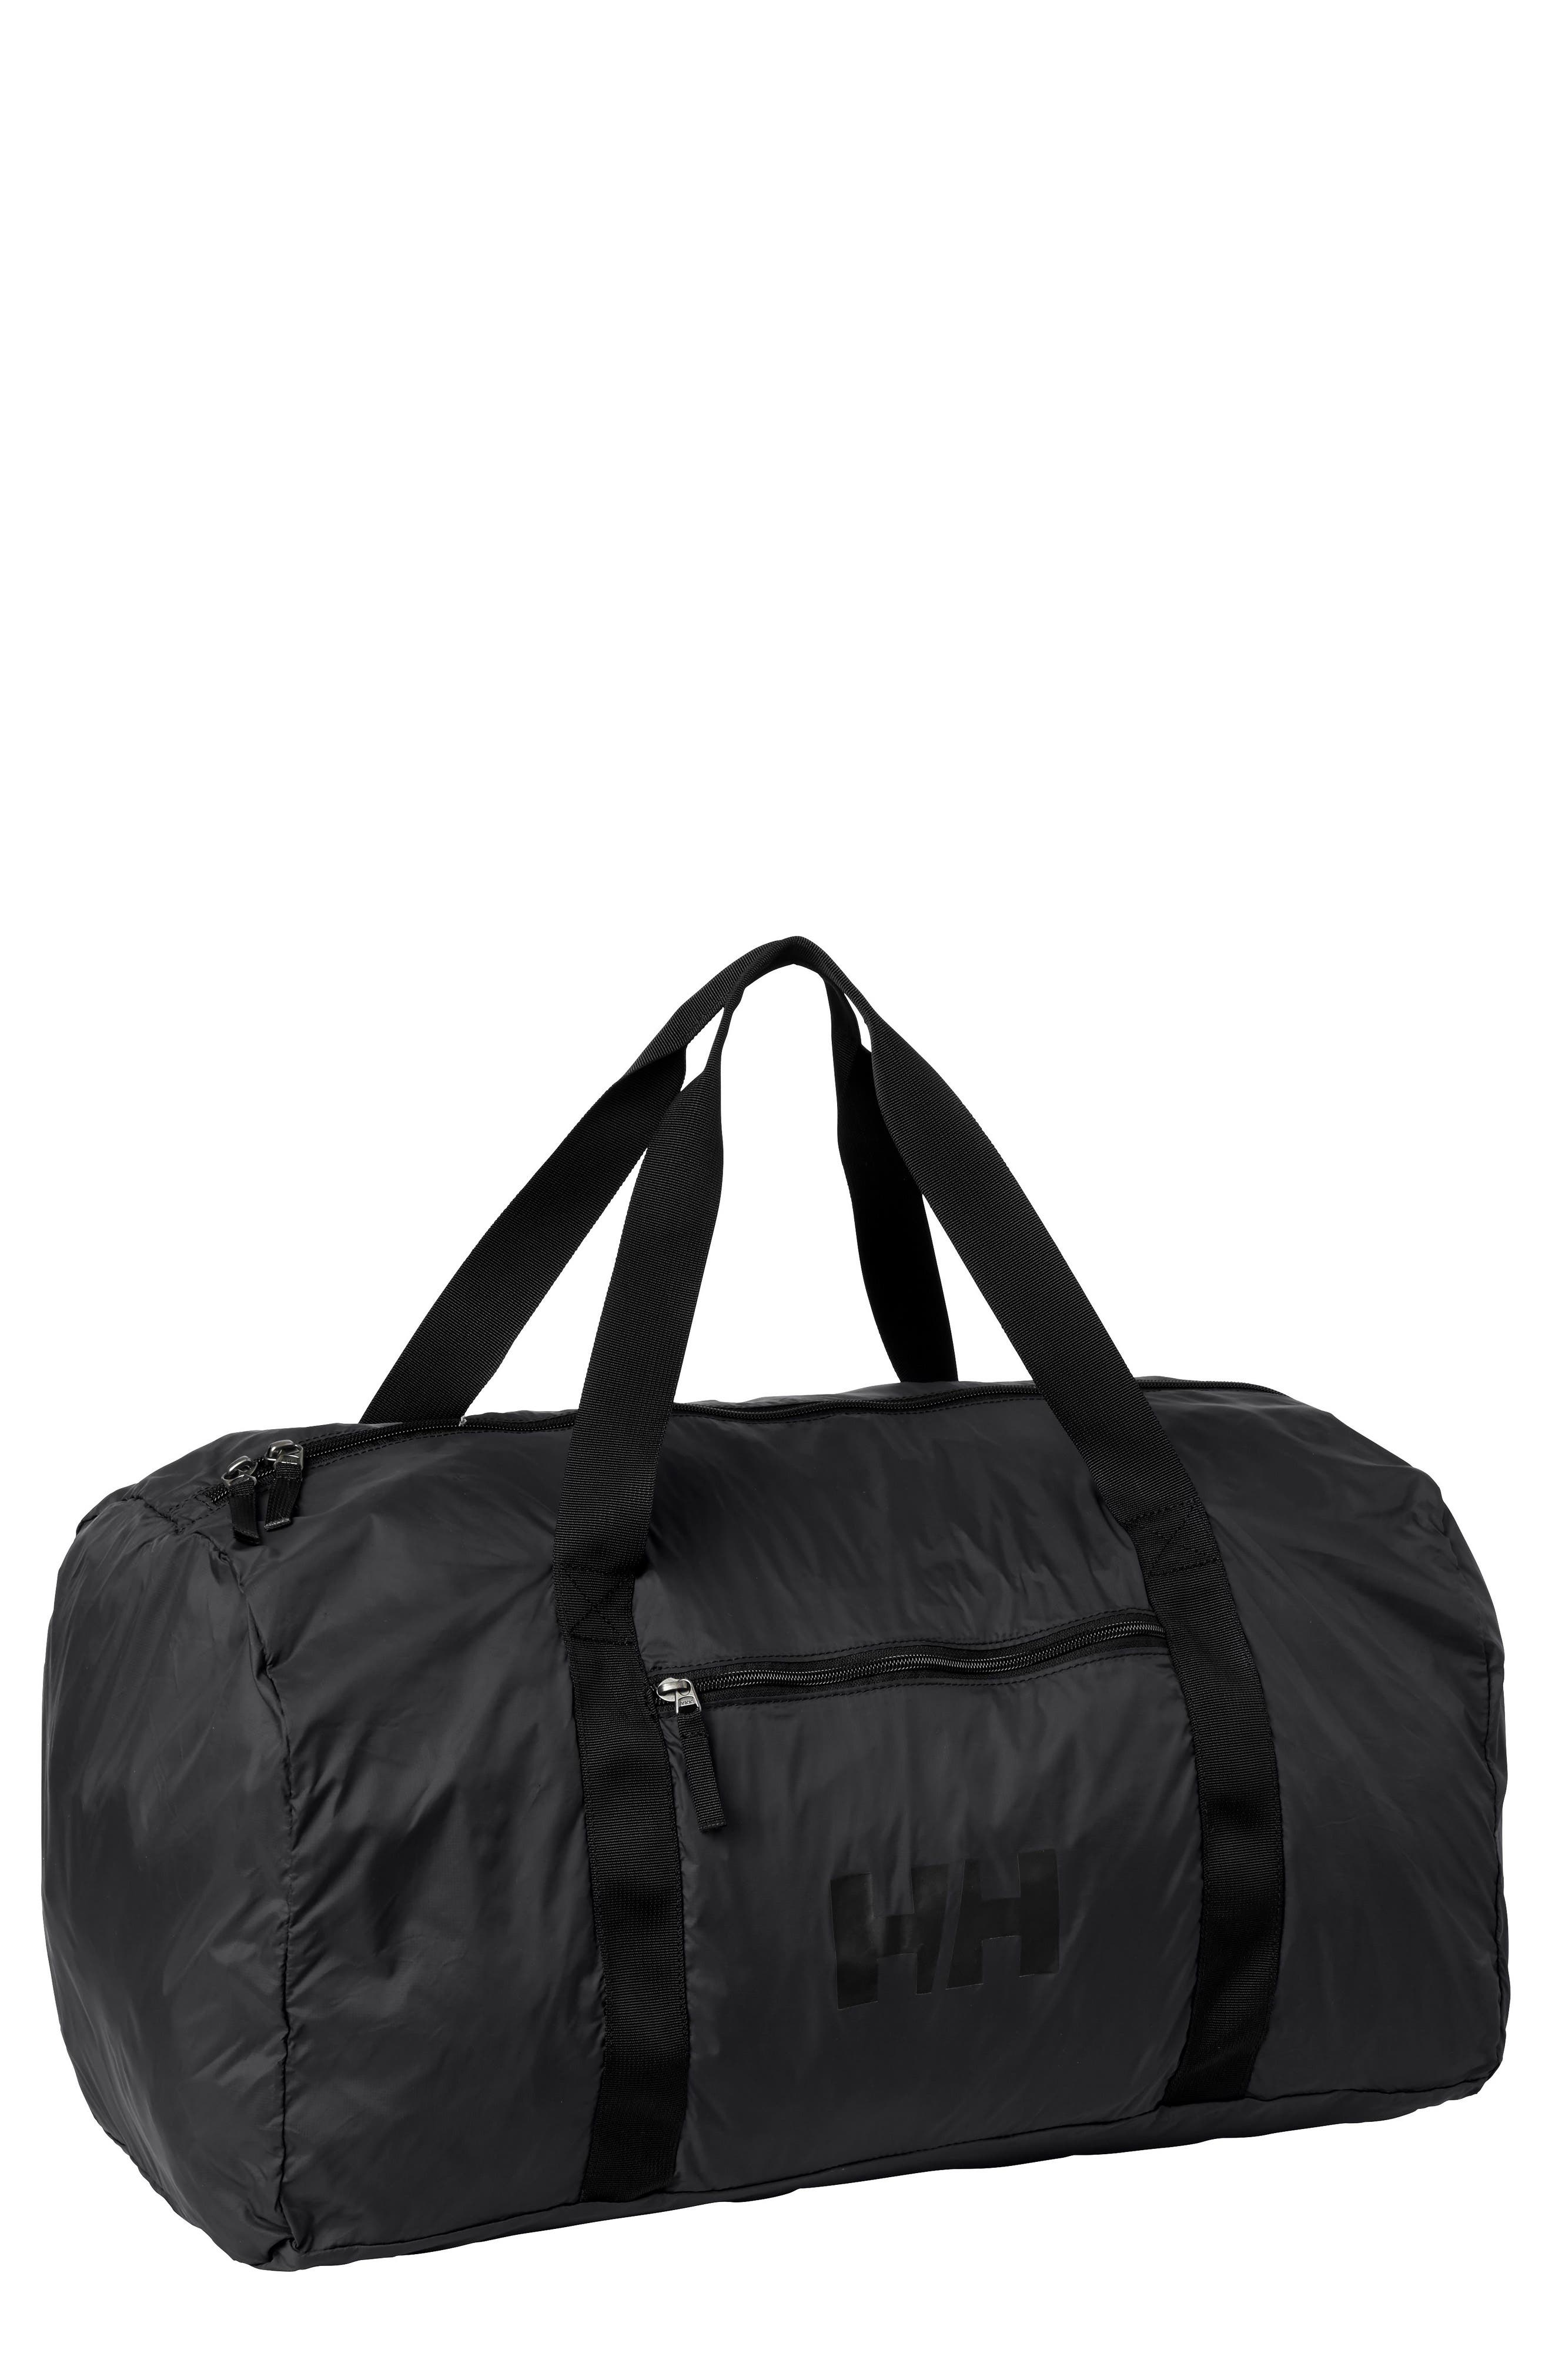 Small Packable Duffel Bag,                             Main thumbnail 1, color,                             001